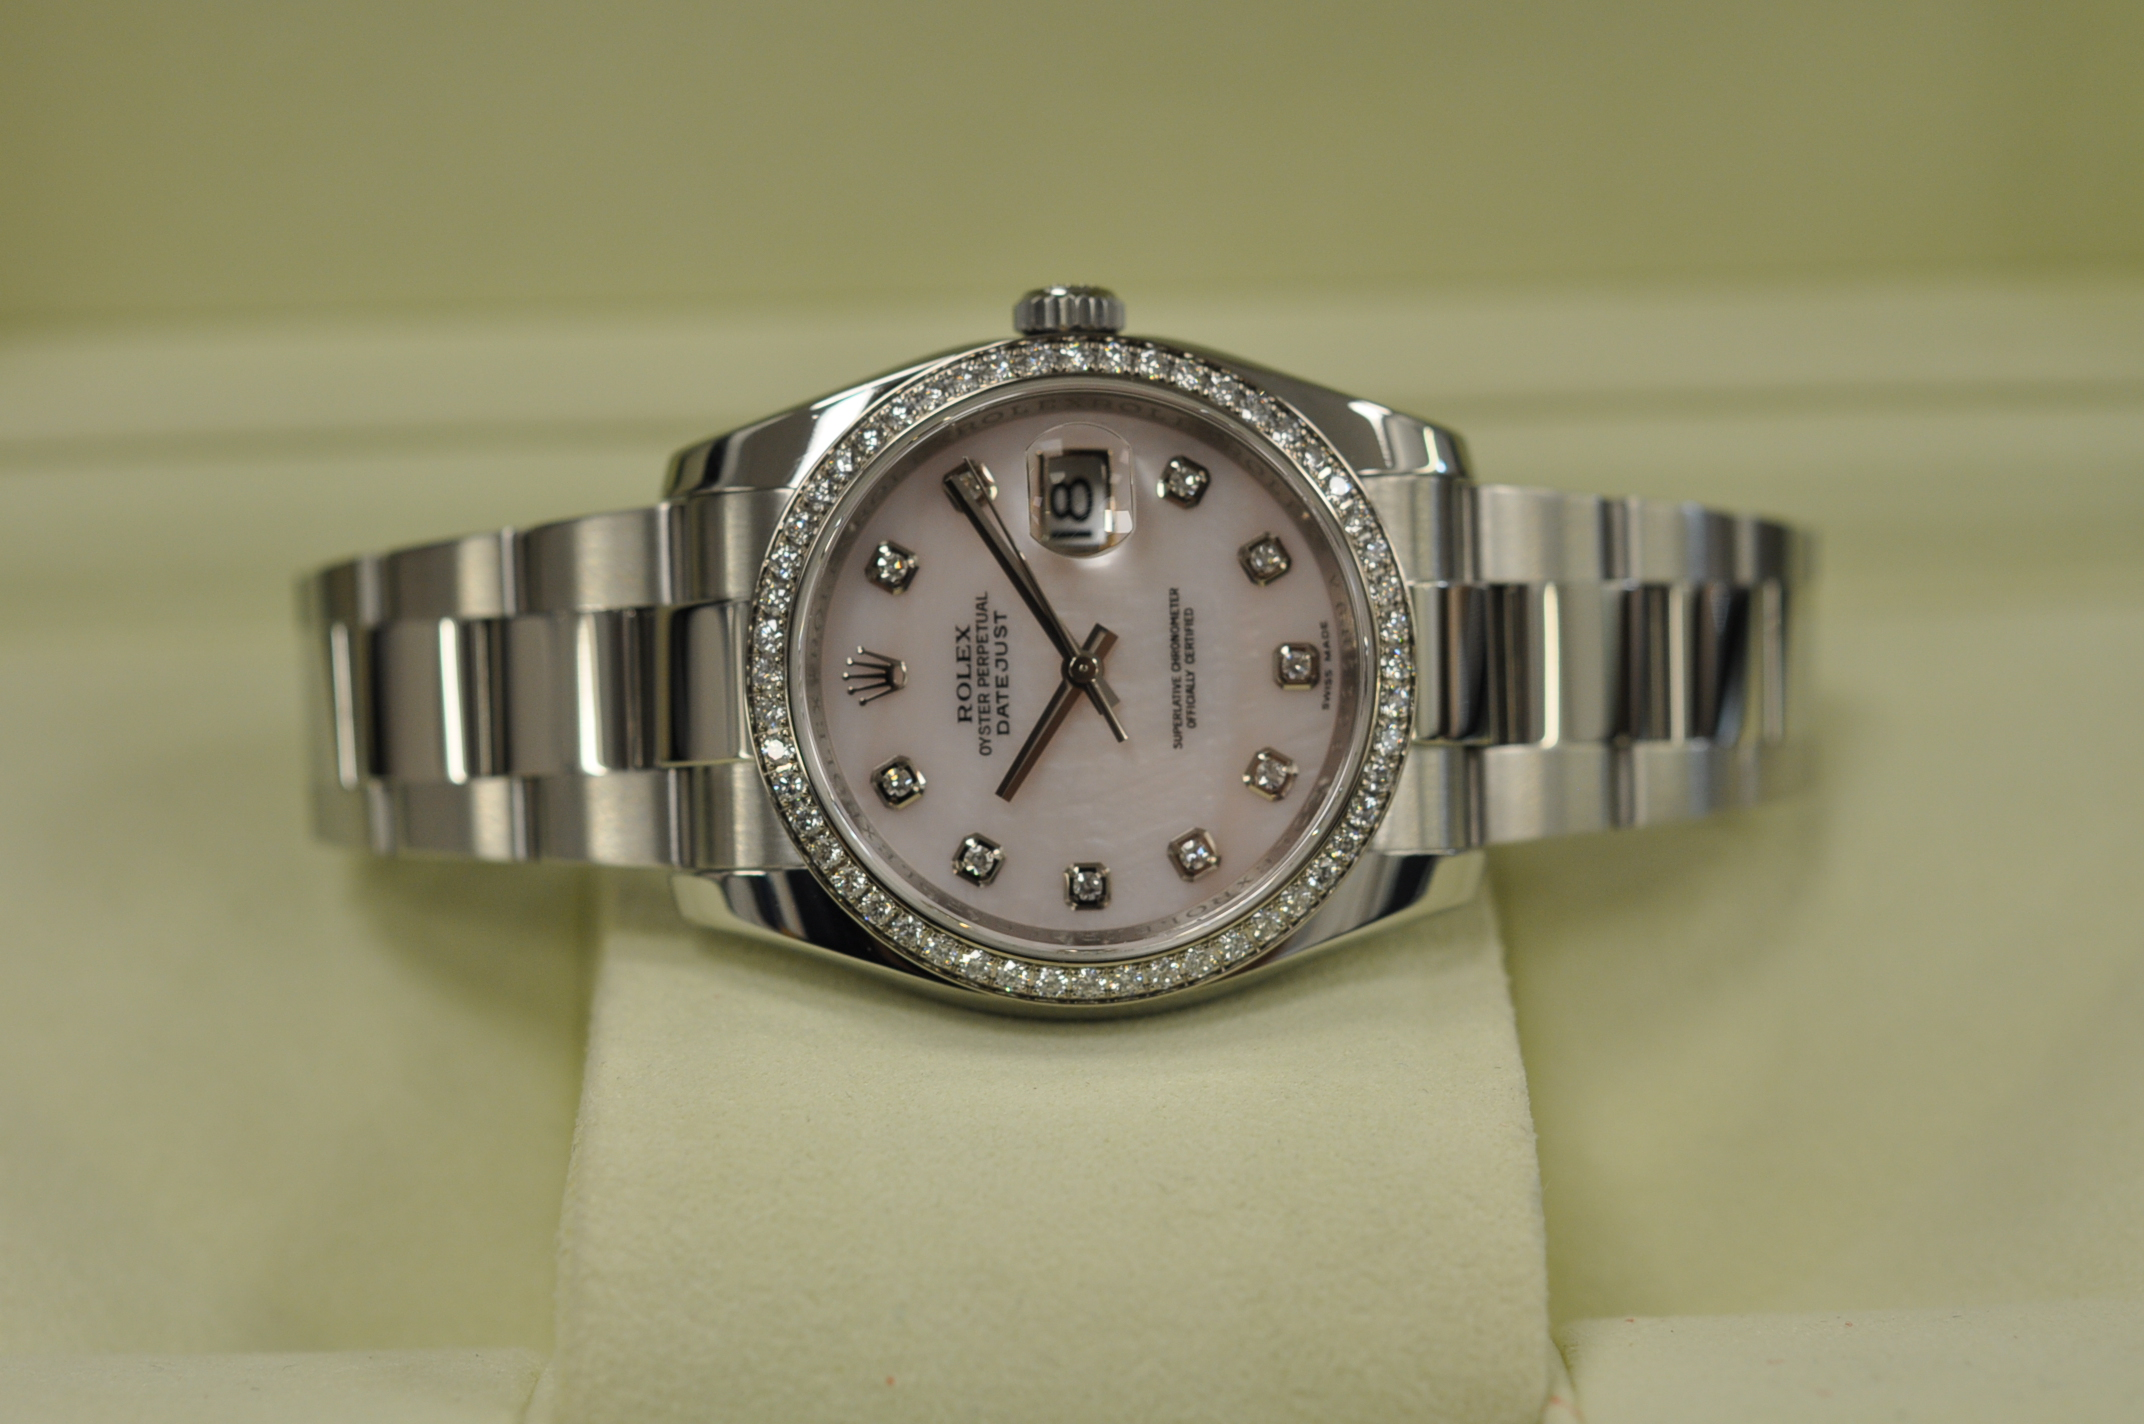 2009 Datejust Diamond dial/bezel